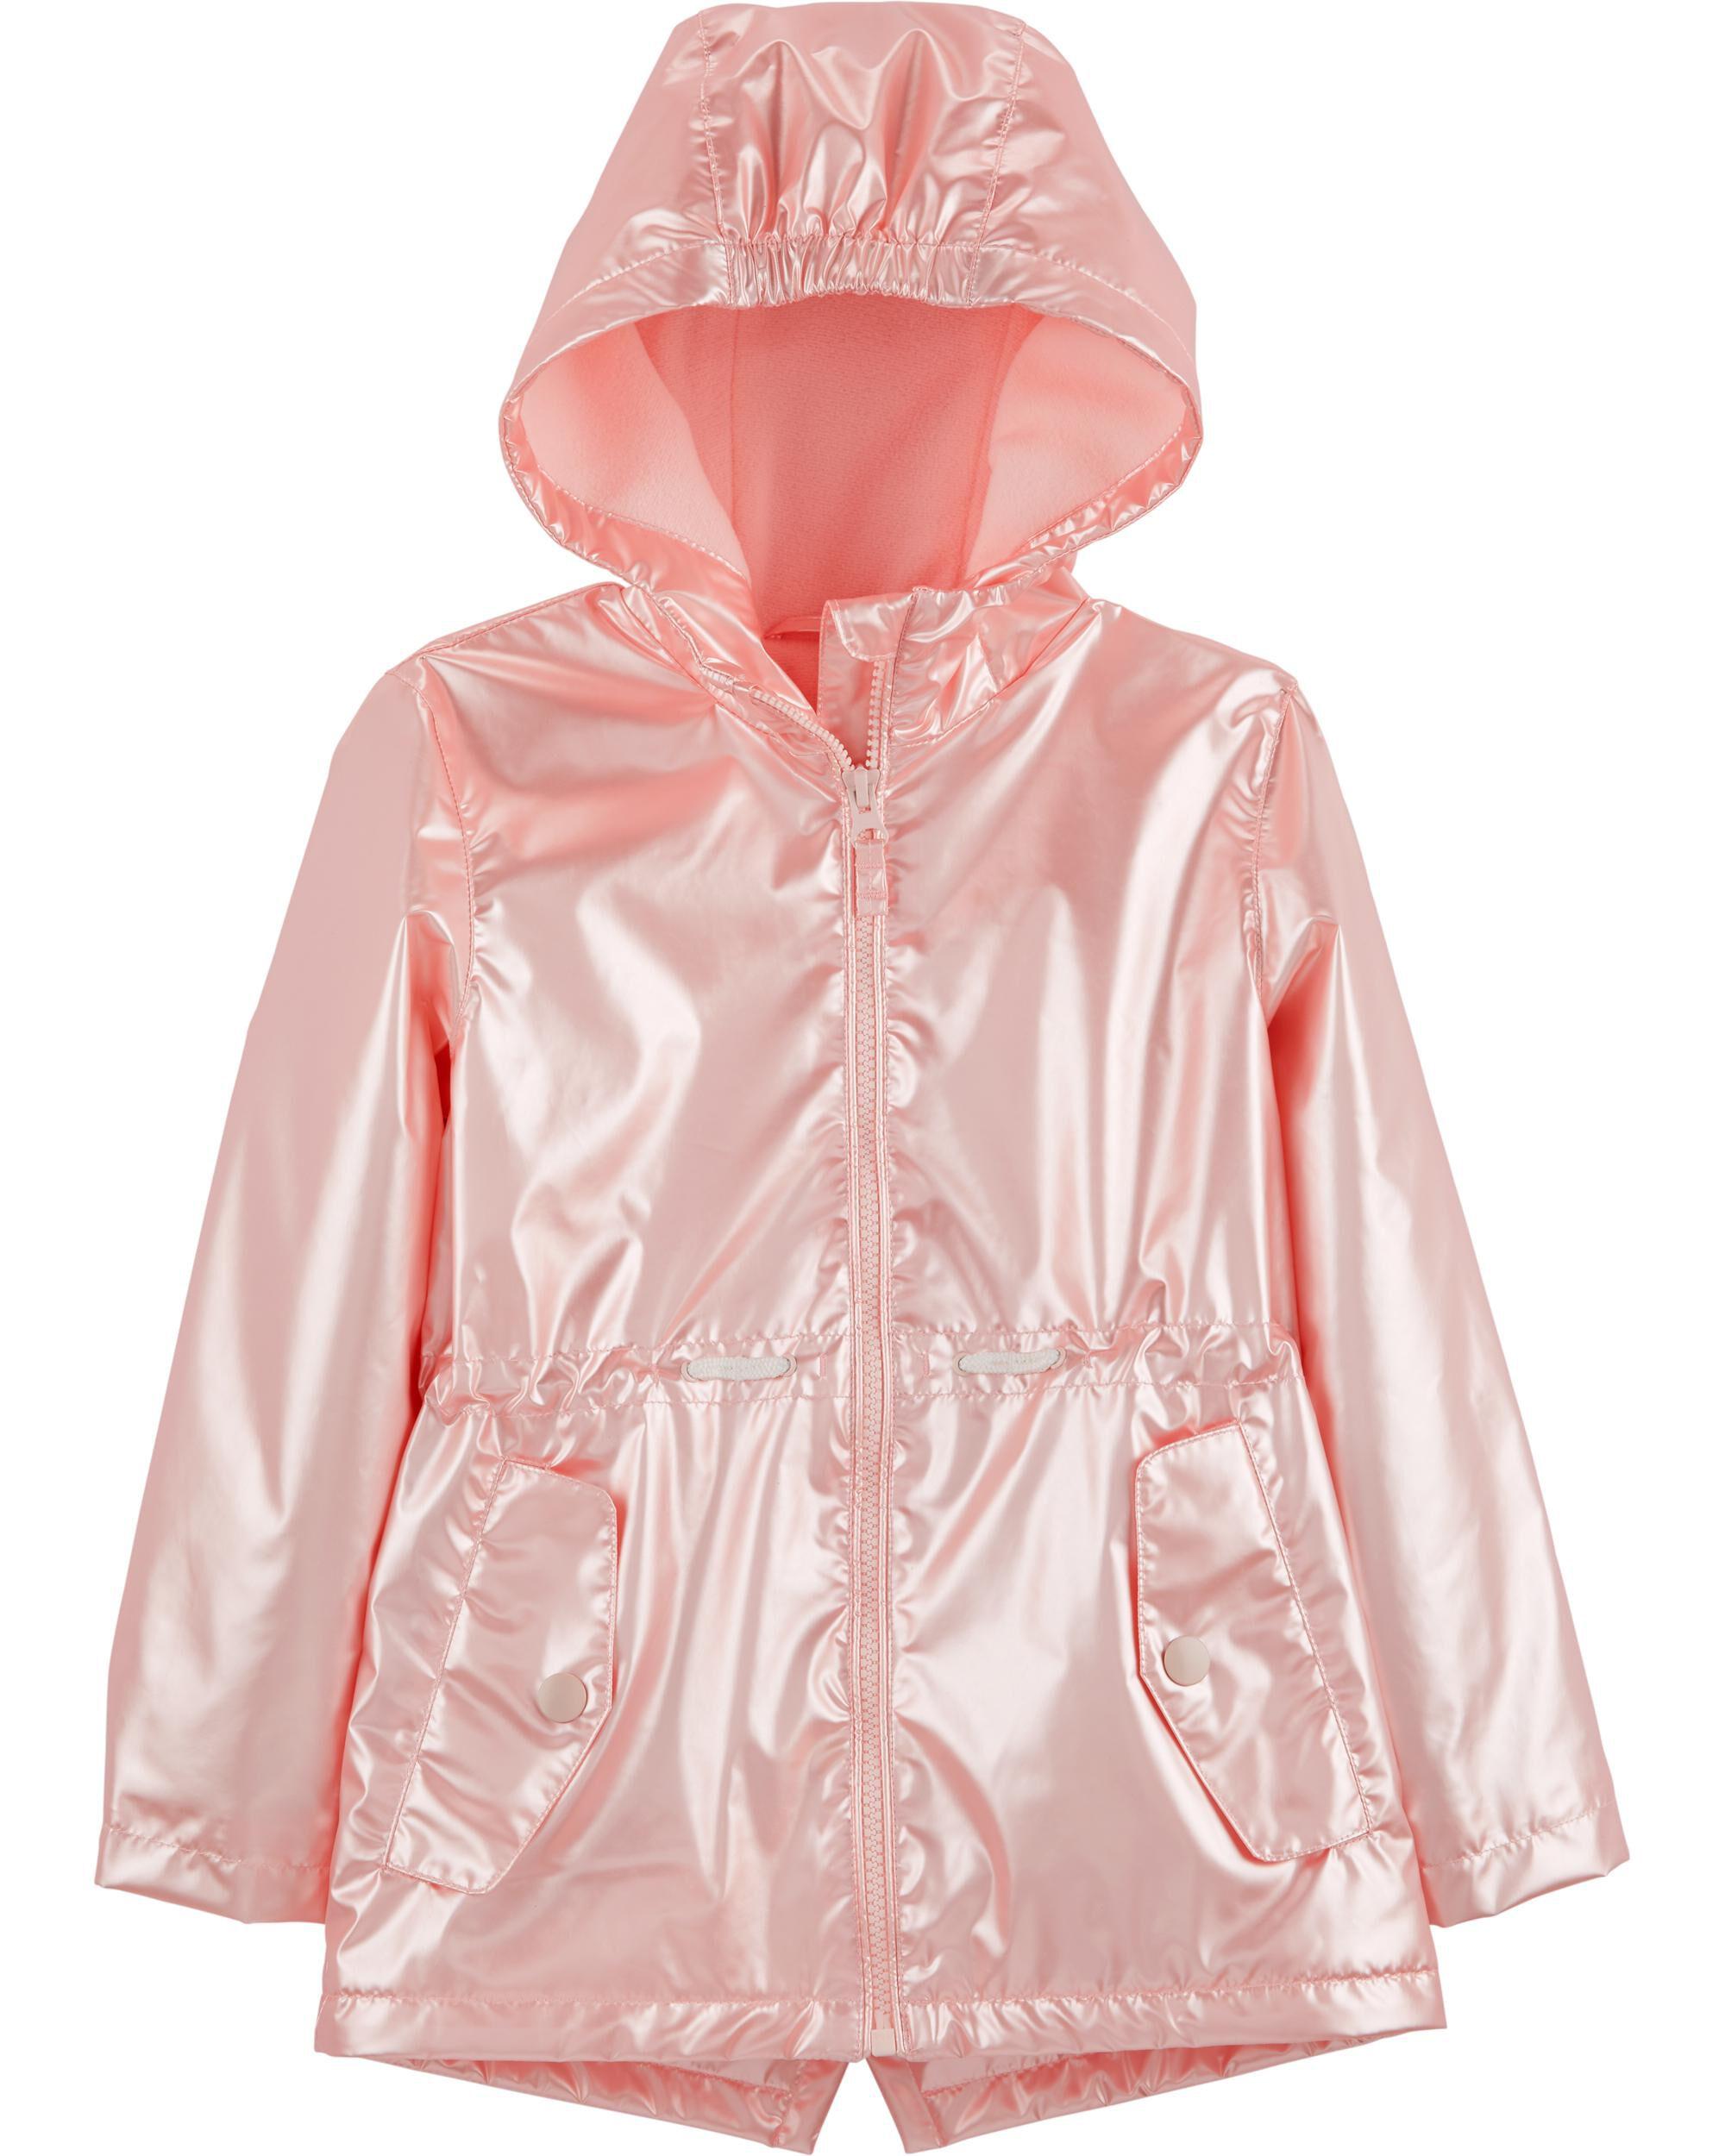 girls gymboree painting pals zip up hooded sweatshirt jacket size 12-24 M Nwt